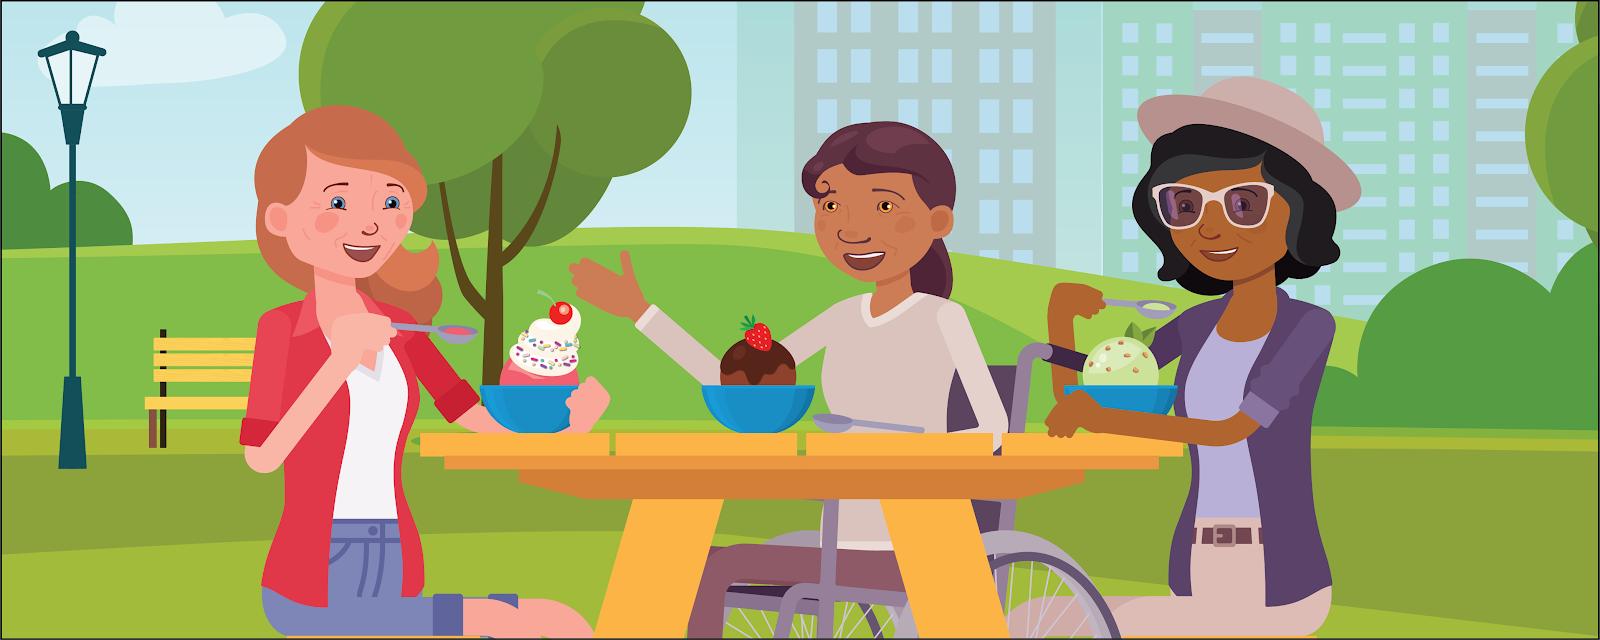 Tasha、Maddie、Isabel がピクニックテーブルに座りアイスクリームを食べています。